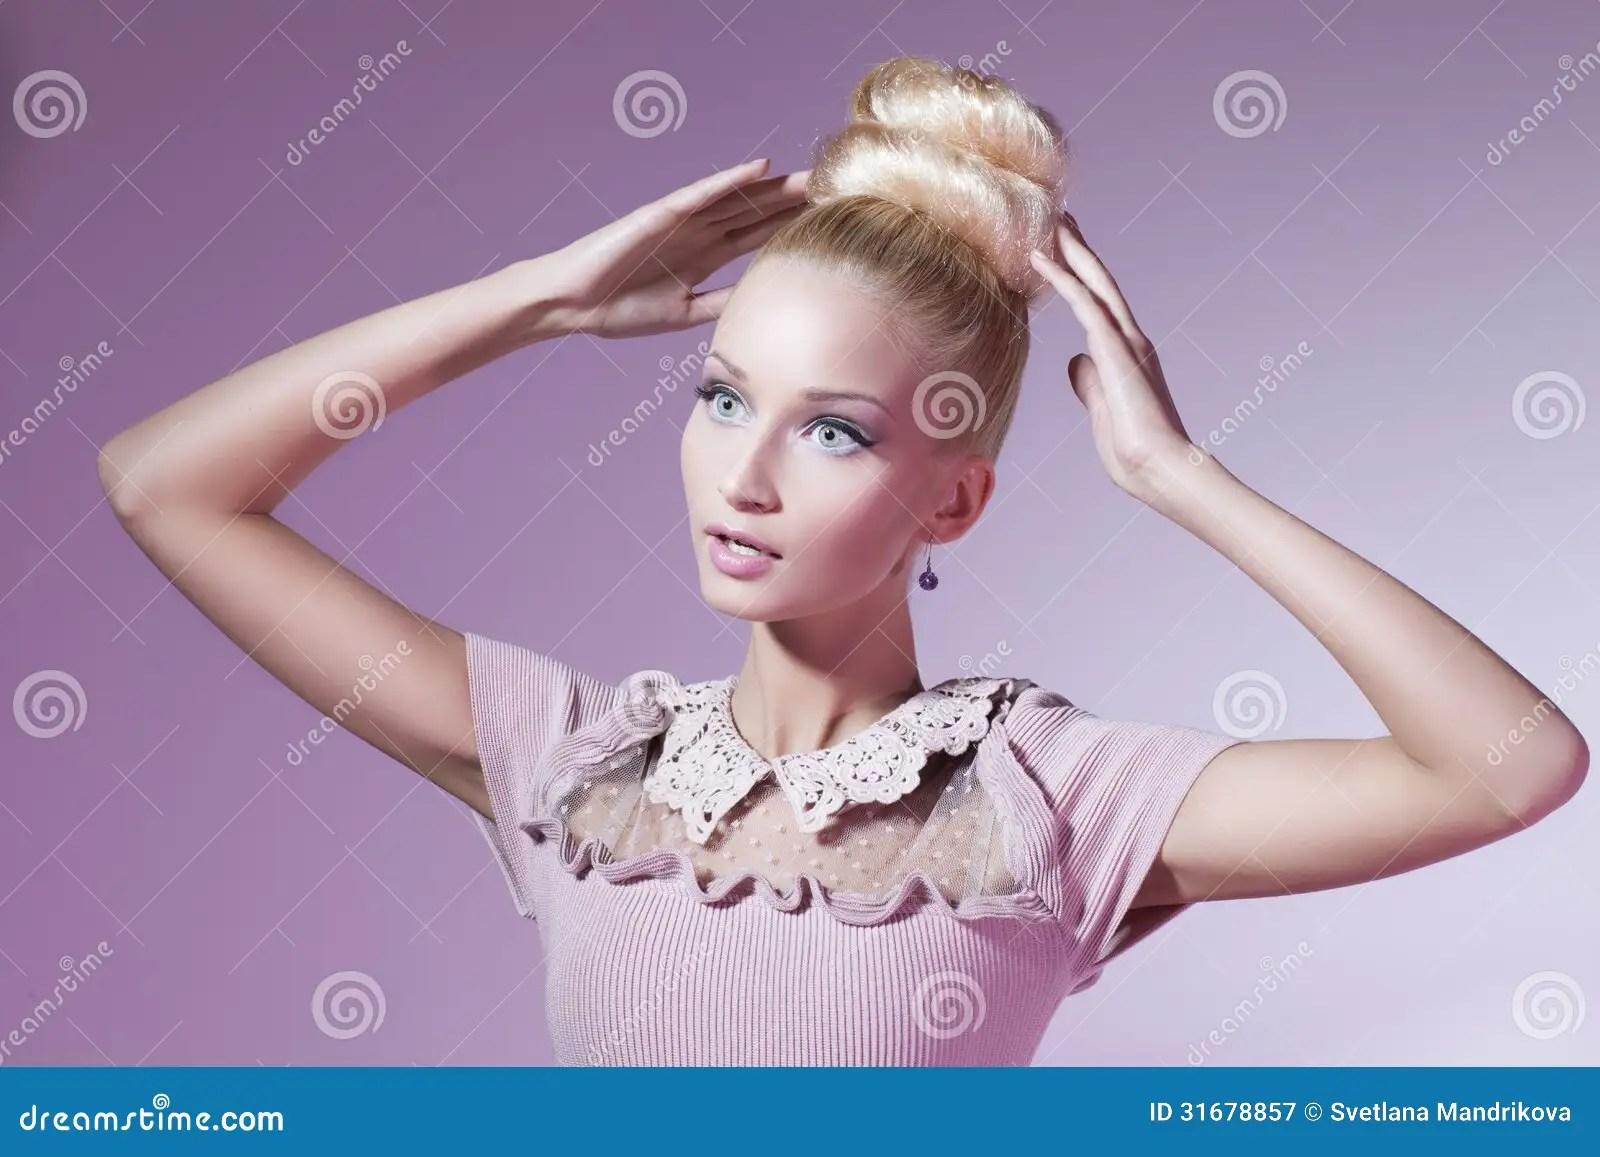 Girl Looking Like Barbie Doll Stock Image  Image 31678857